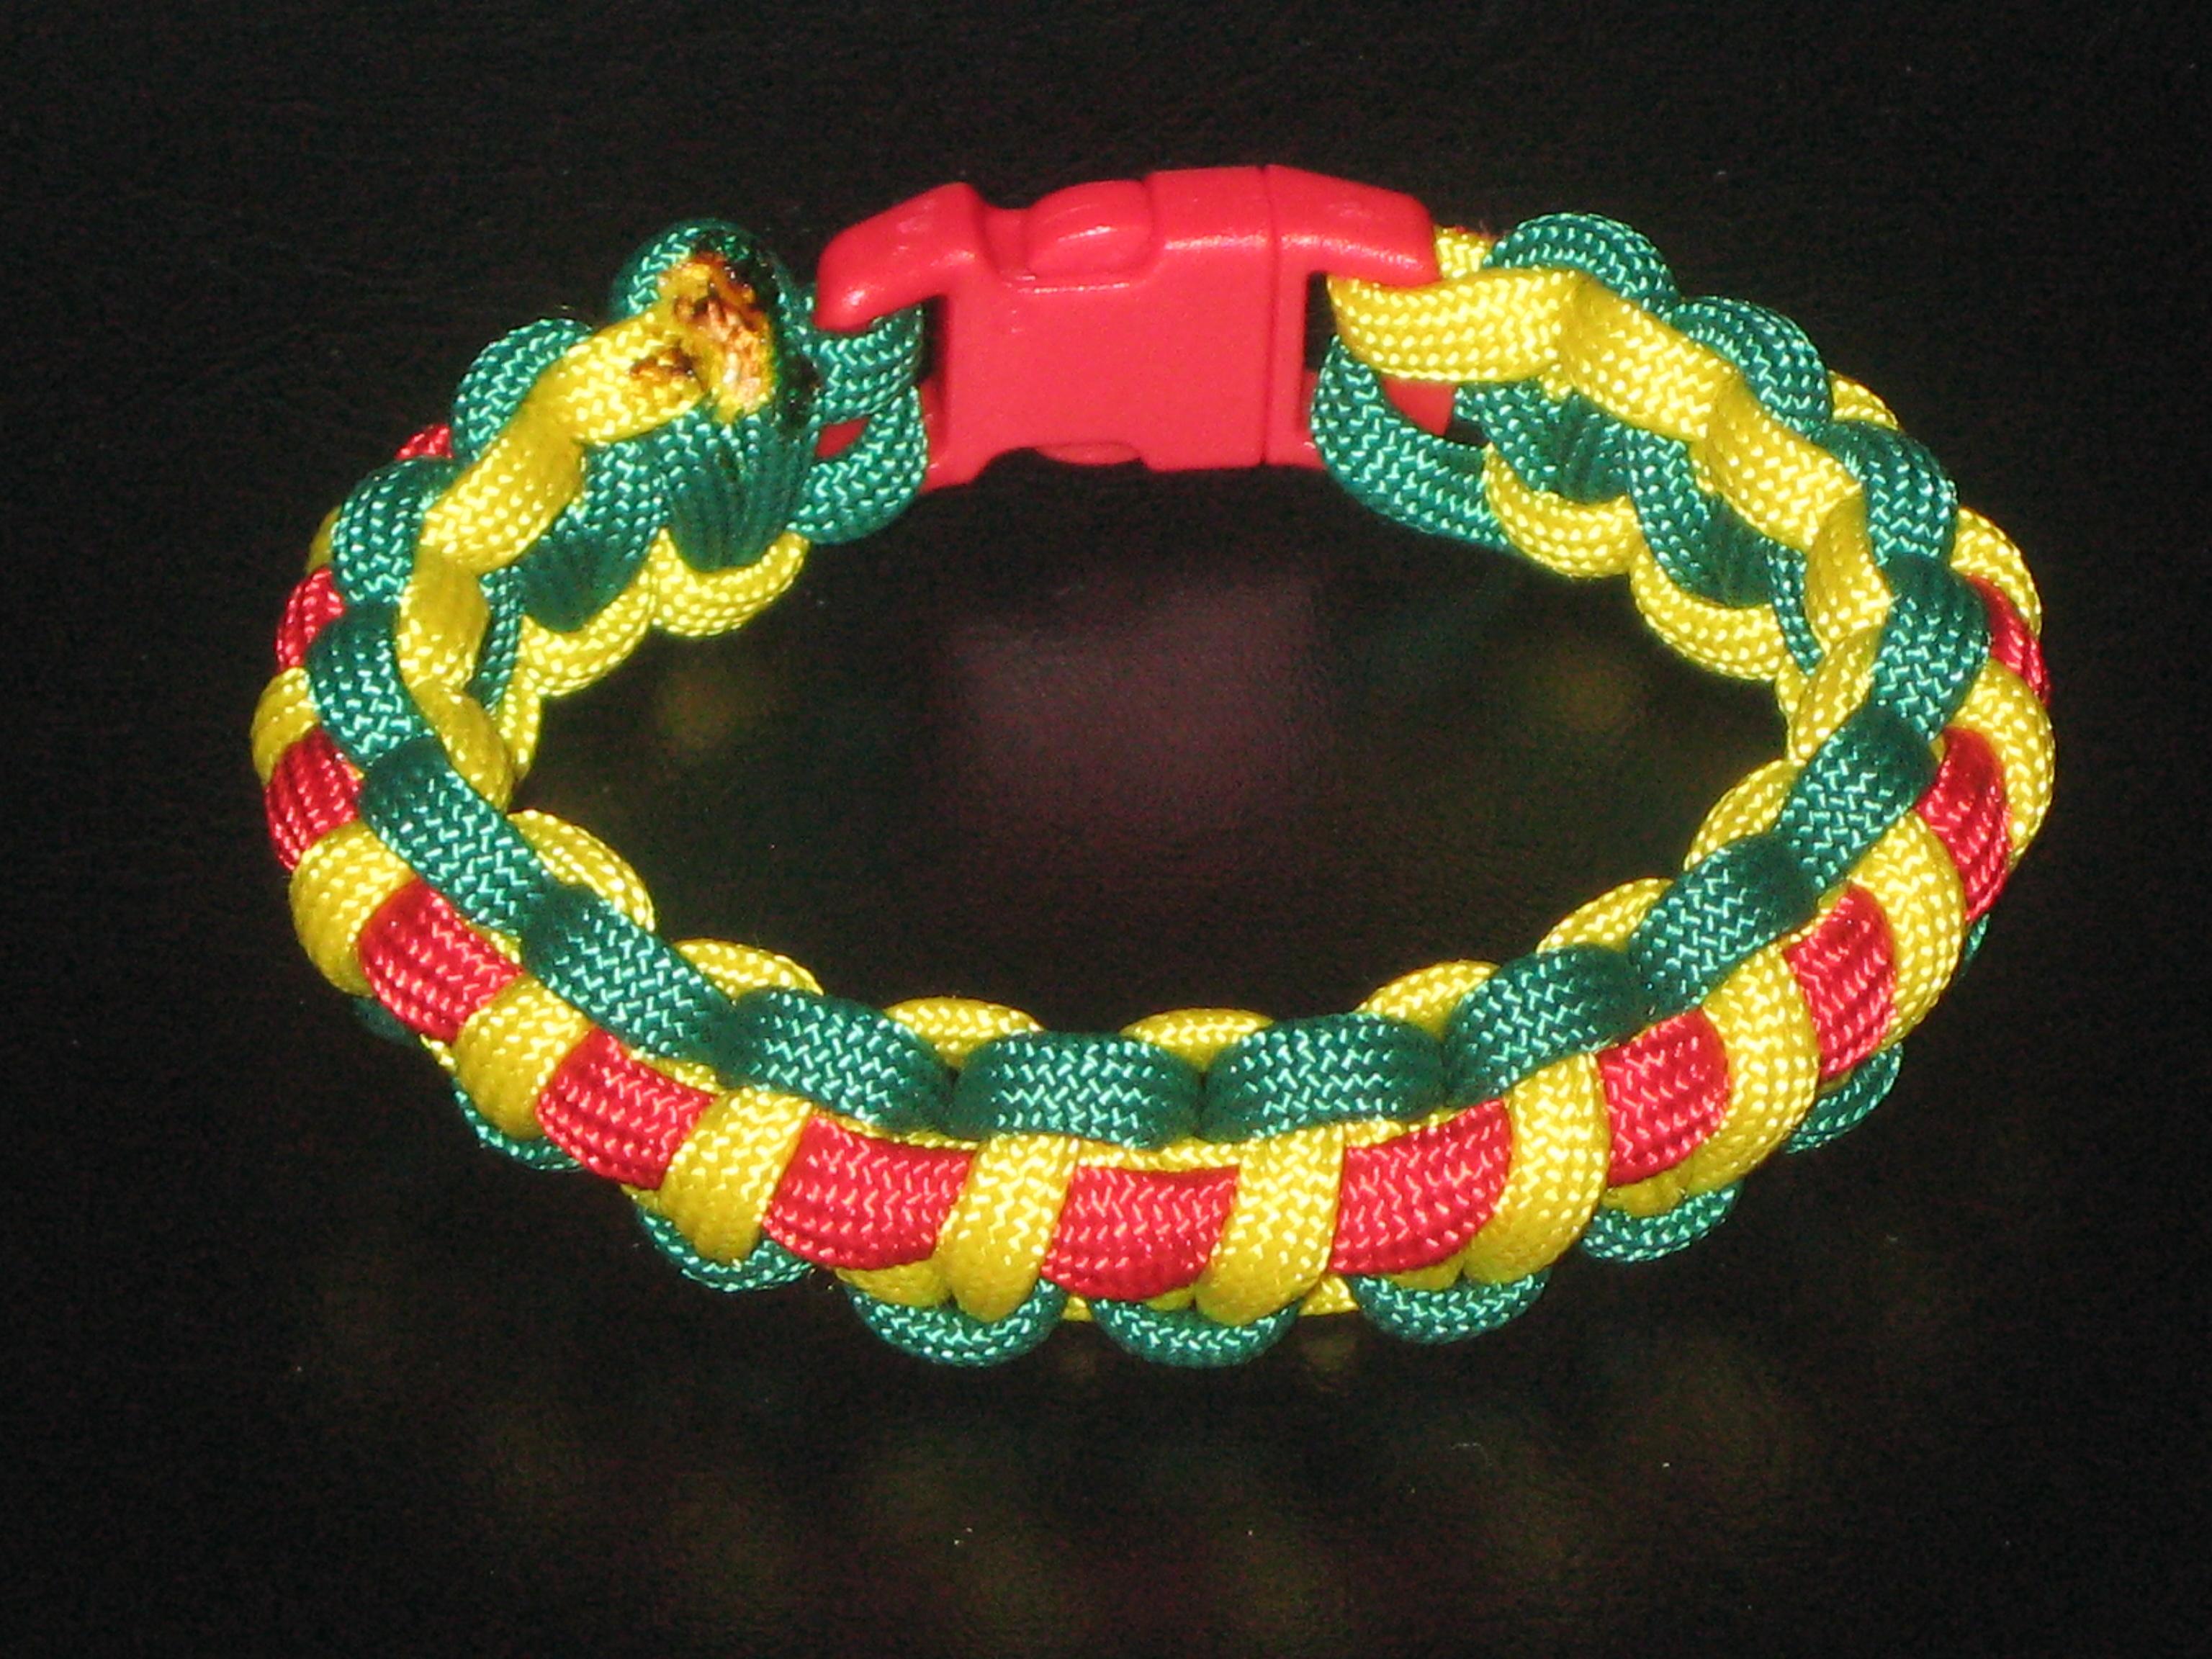 All New Survival Bracelets By Fort Detroyon Survival Llc